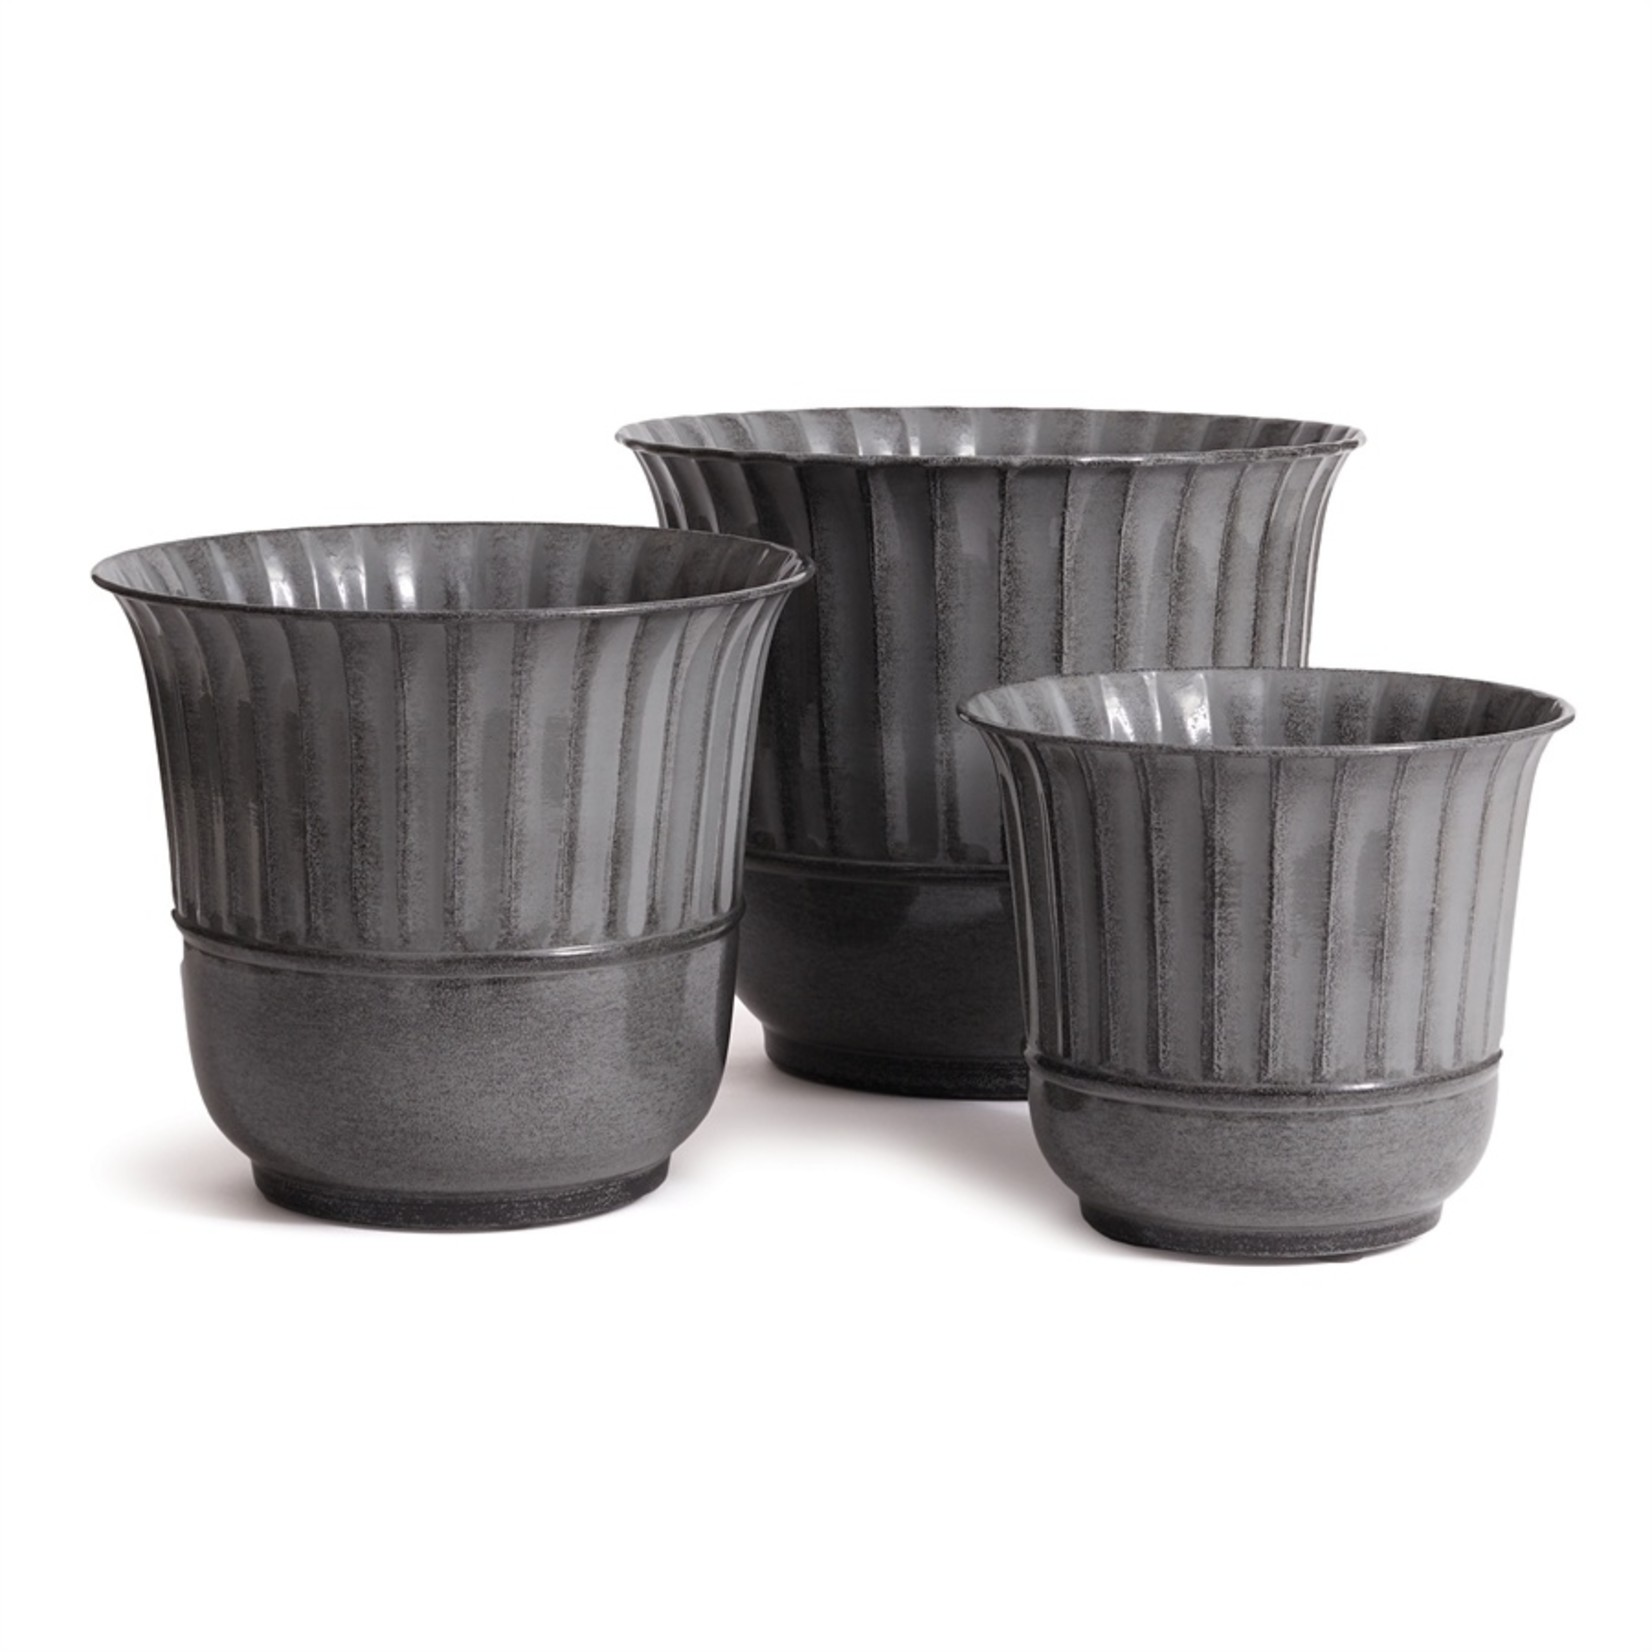 Napa Home and Garden Makayla Pots - Gray